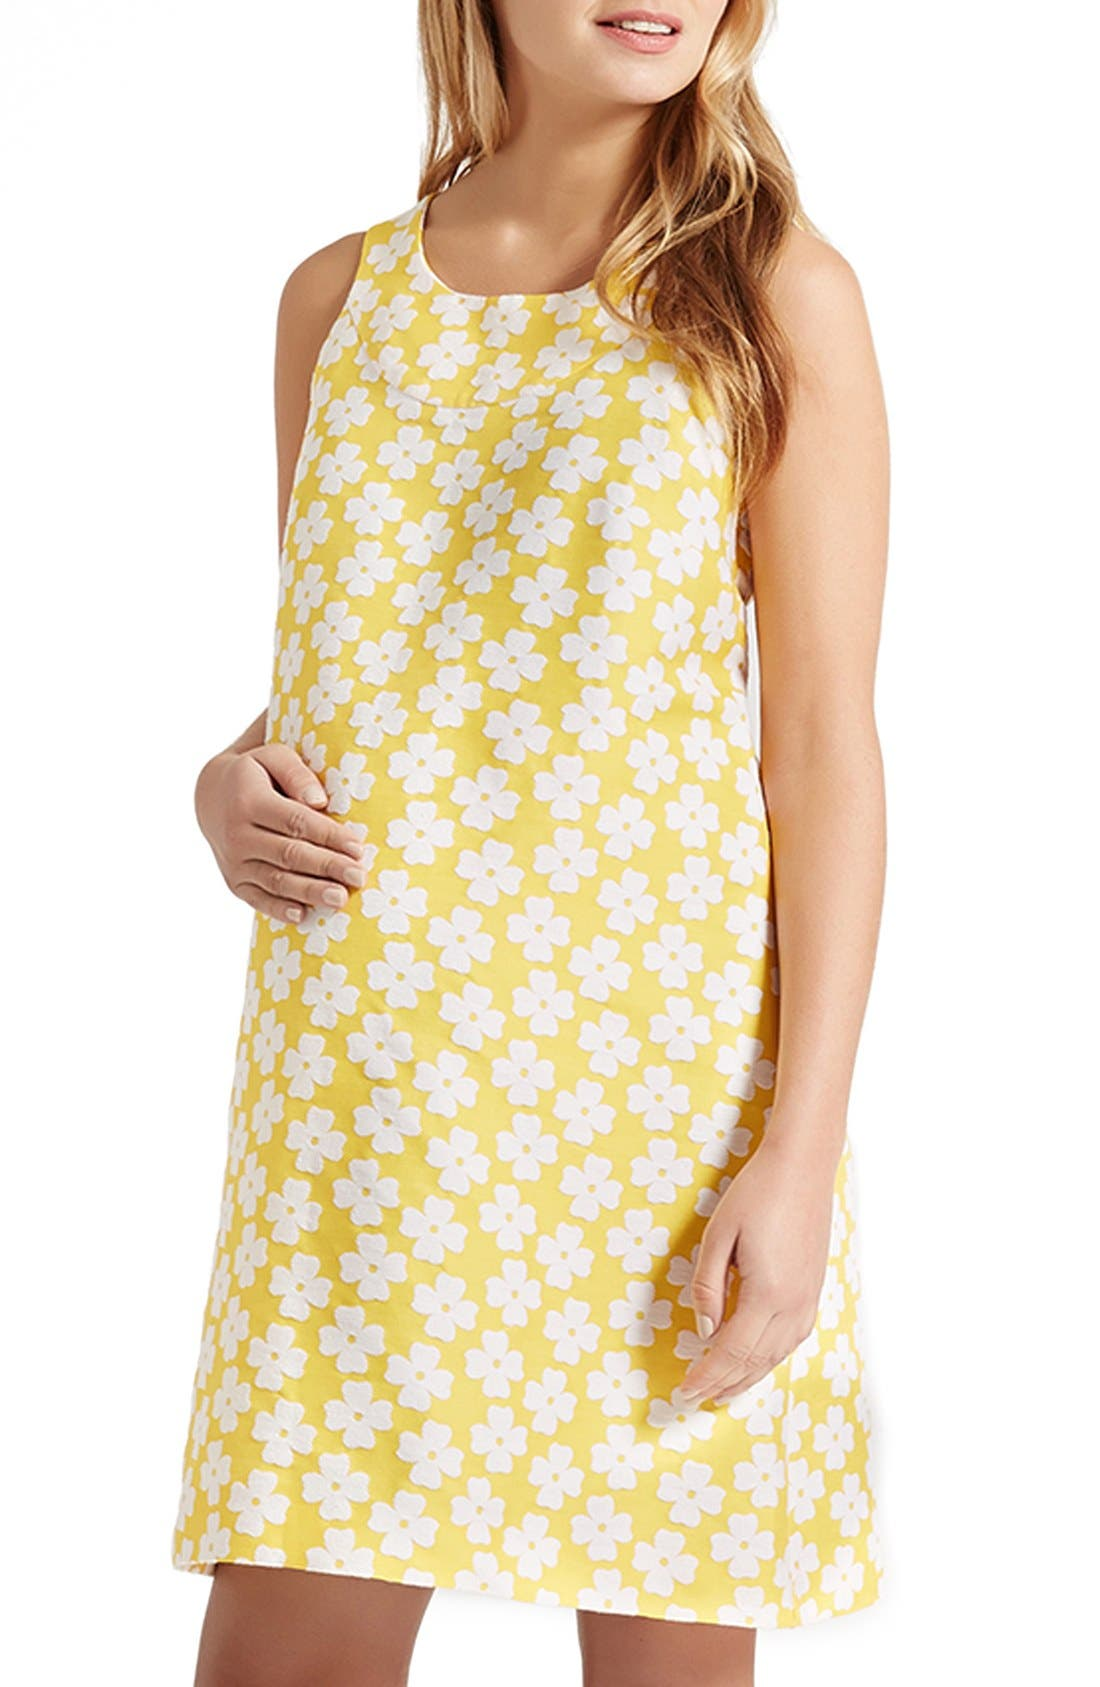 Alternate Image 1 Selected - Madderson London 'Hattie' Daisy Jacquard Maternity Shift Dress